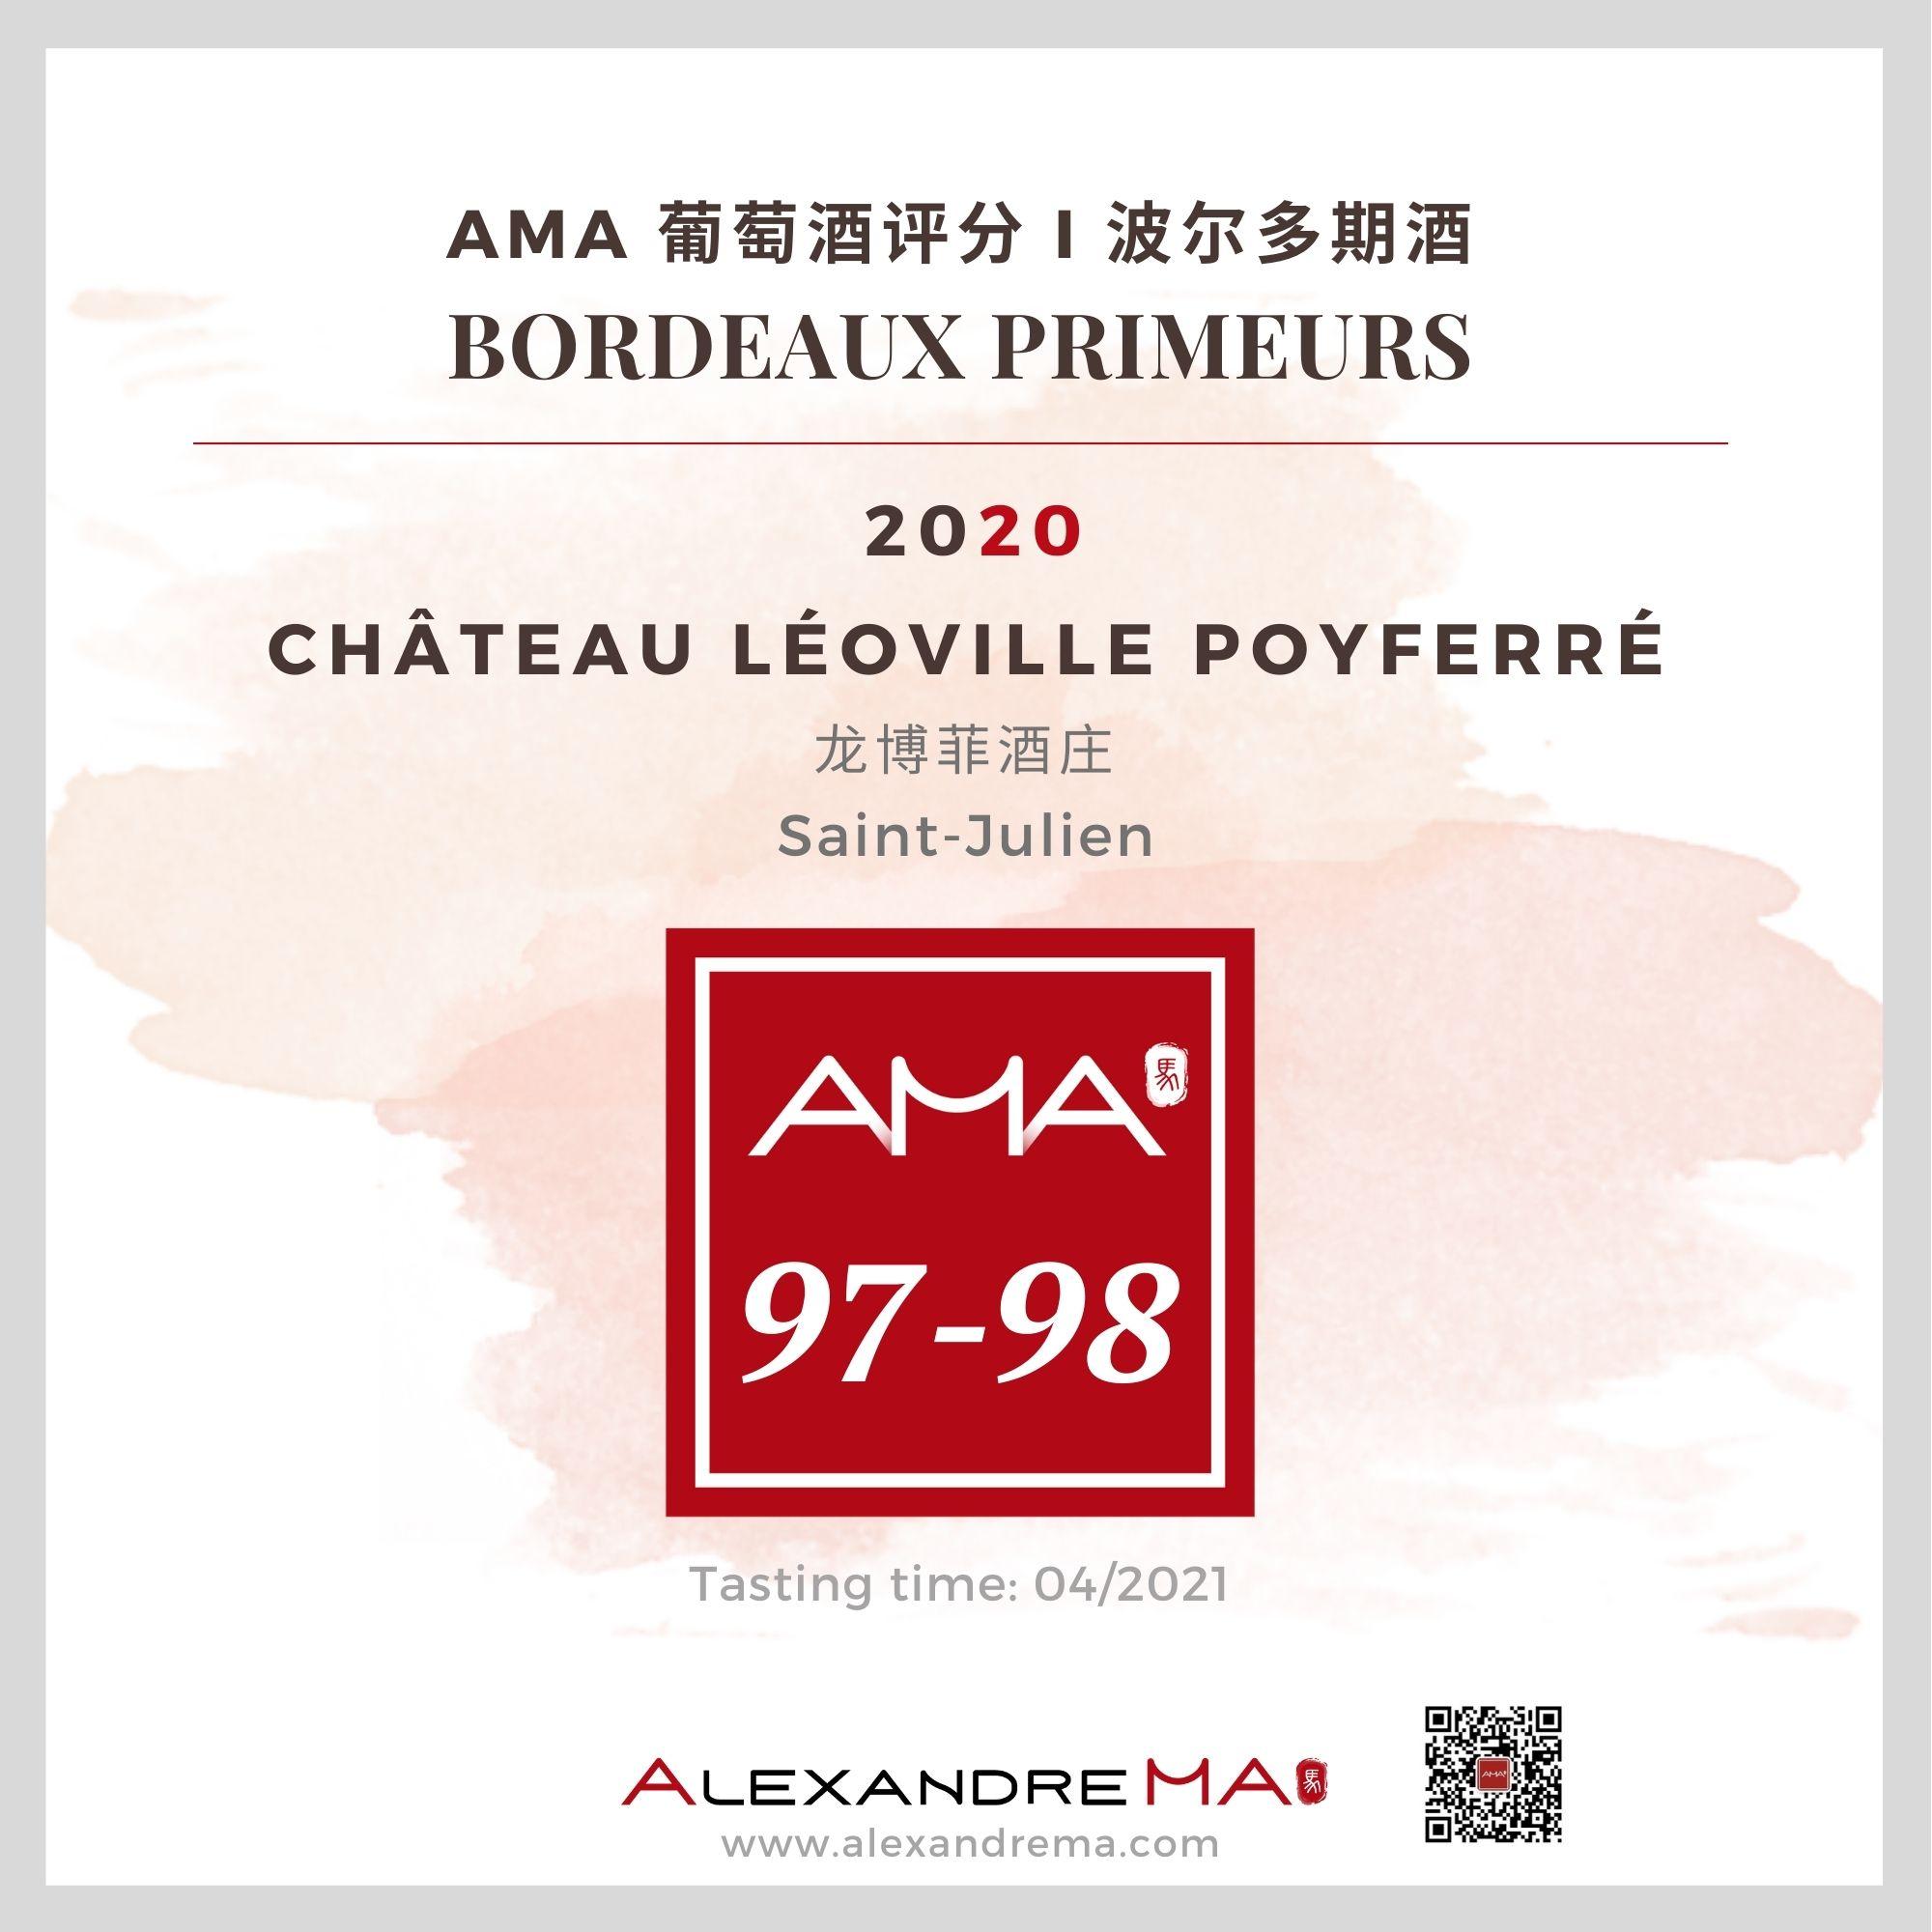 Château Léoville Poyferré 2020 - Alexandre MA